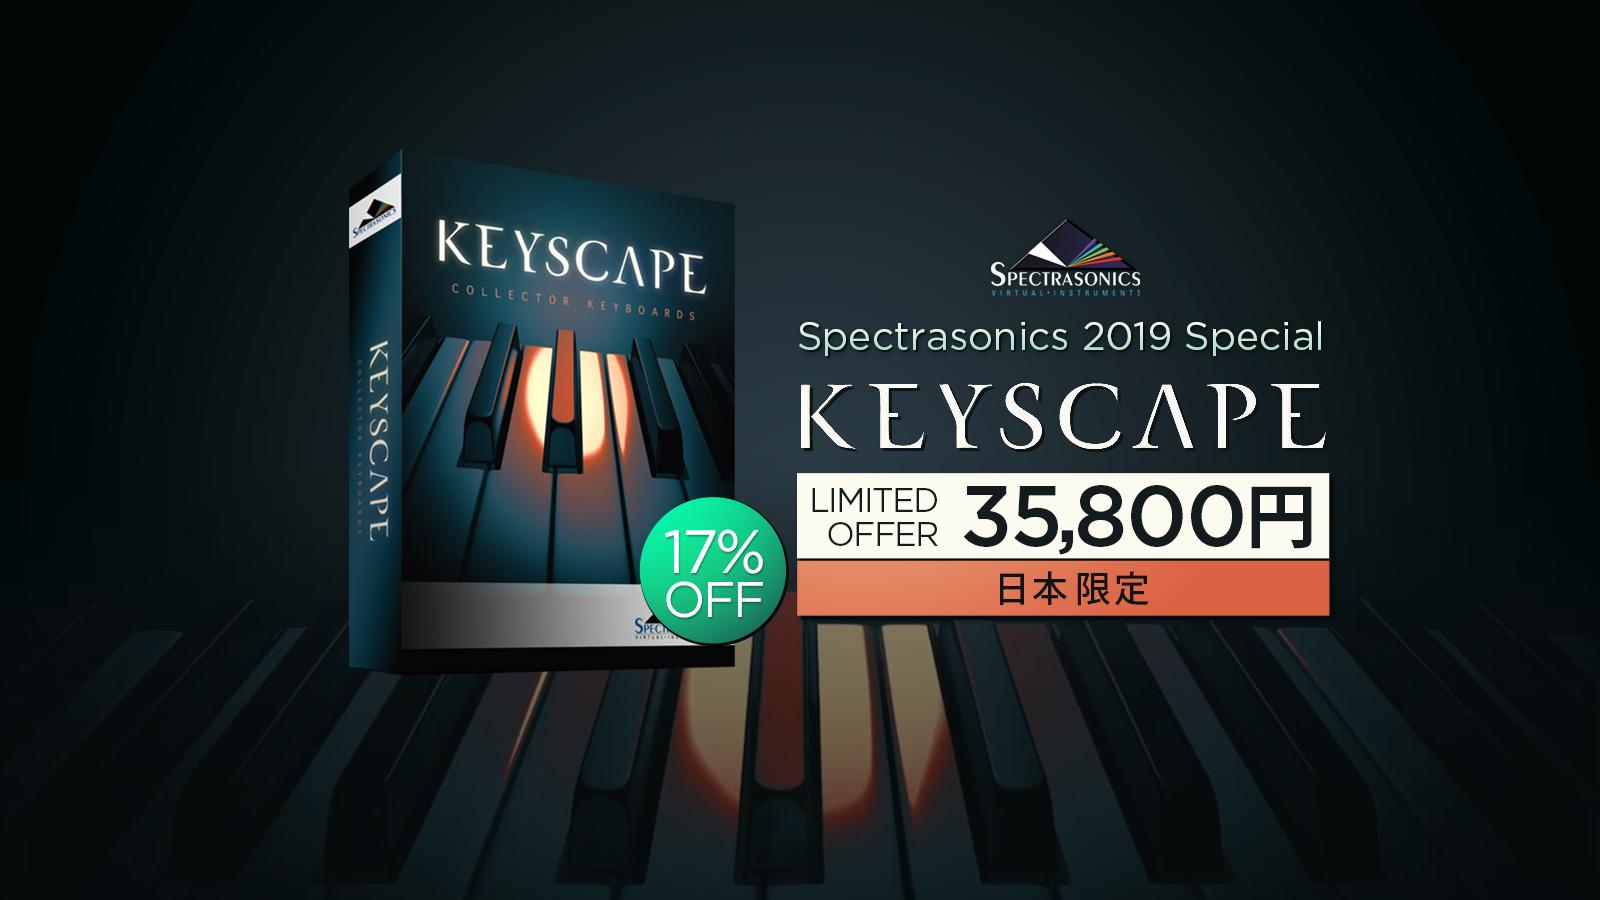 日本限定!Spectrasonics 2019 Special Sale : Keyscape